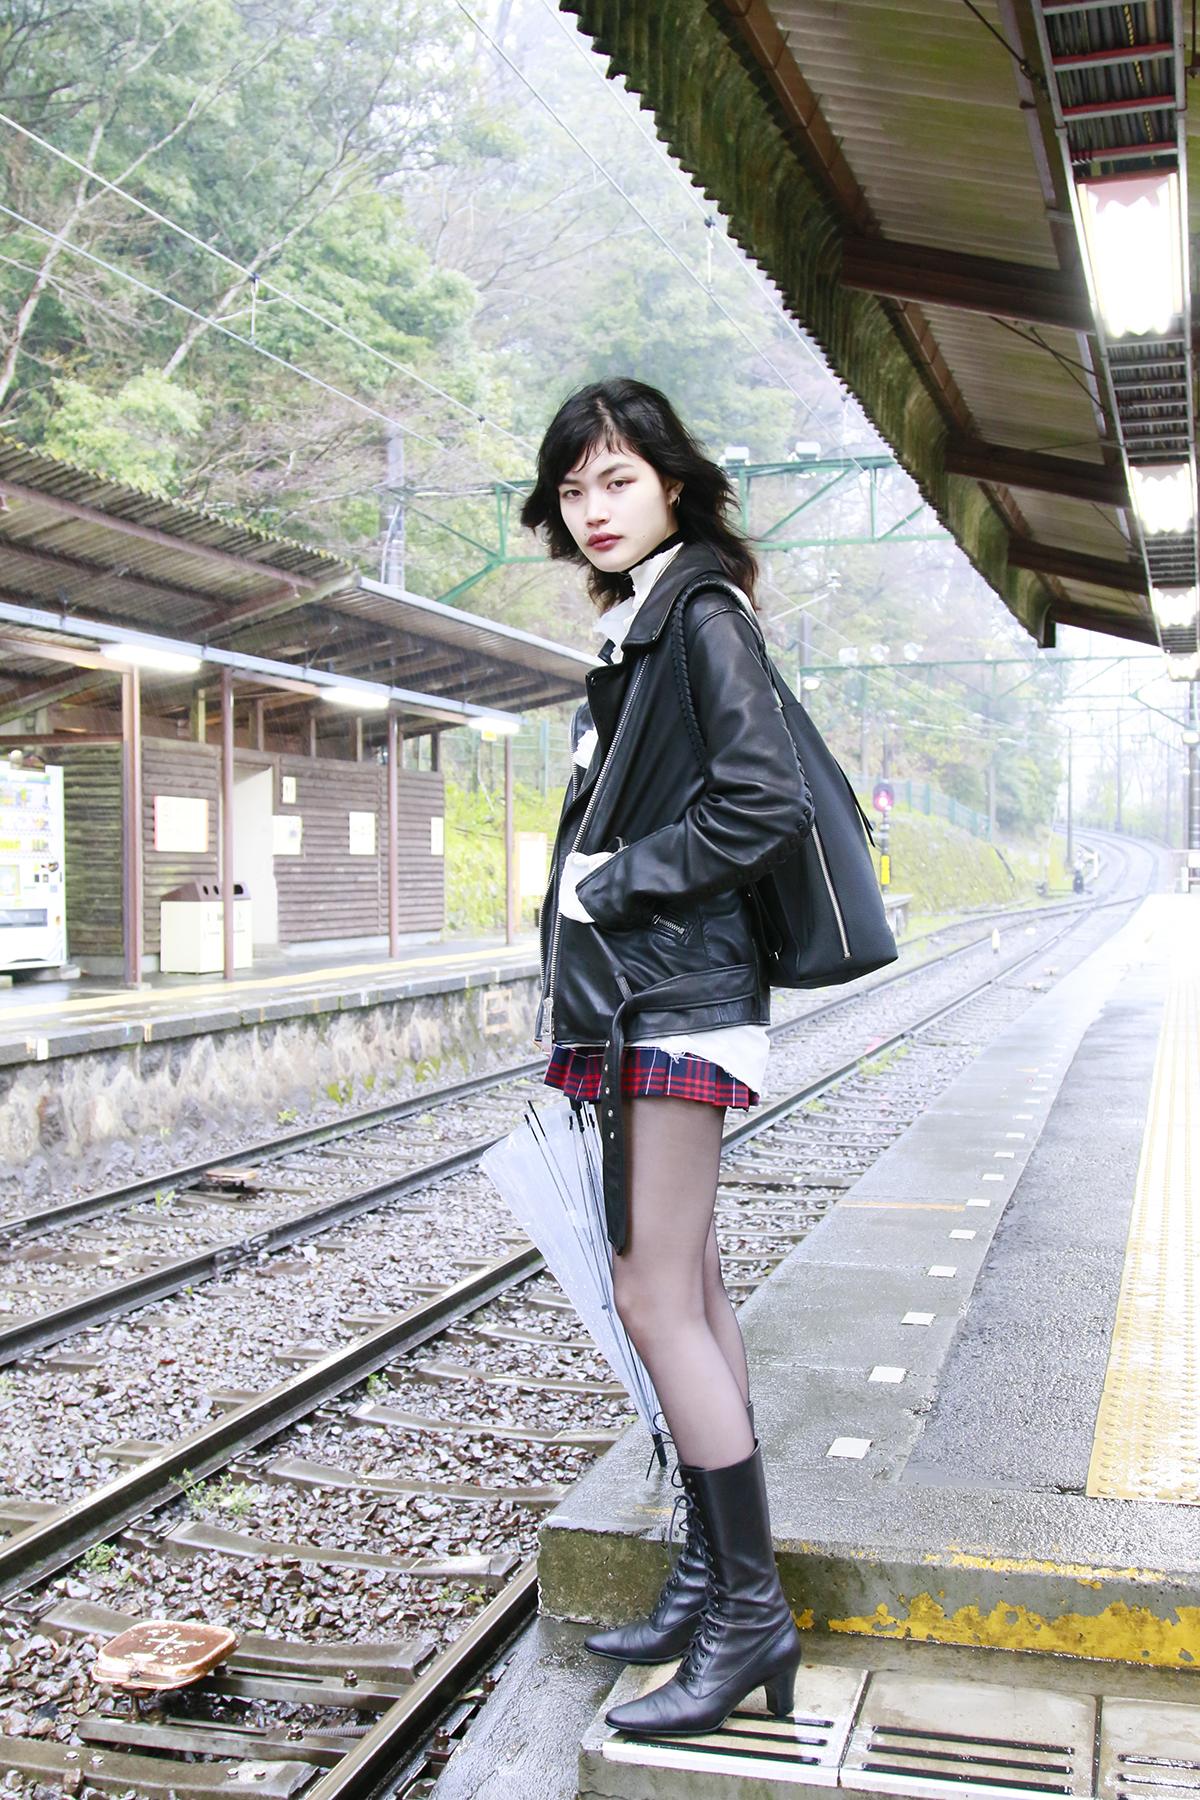 ALLSAINTS_Rina Fukushi_1